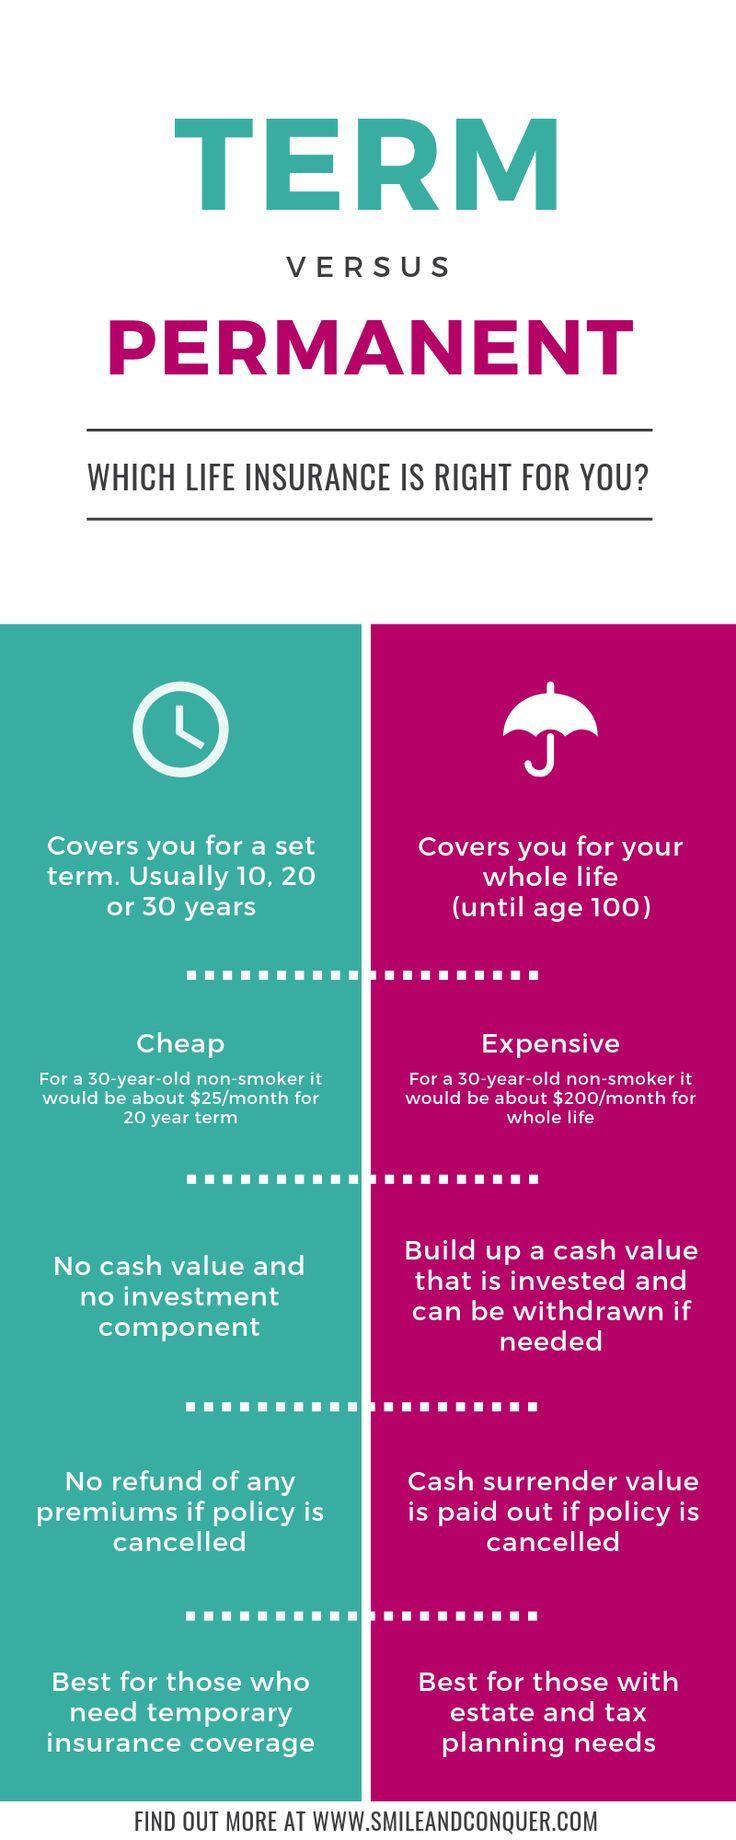 900 Money Advice Ideas In 2021 Money Advice Money Money Saving Tips